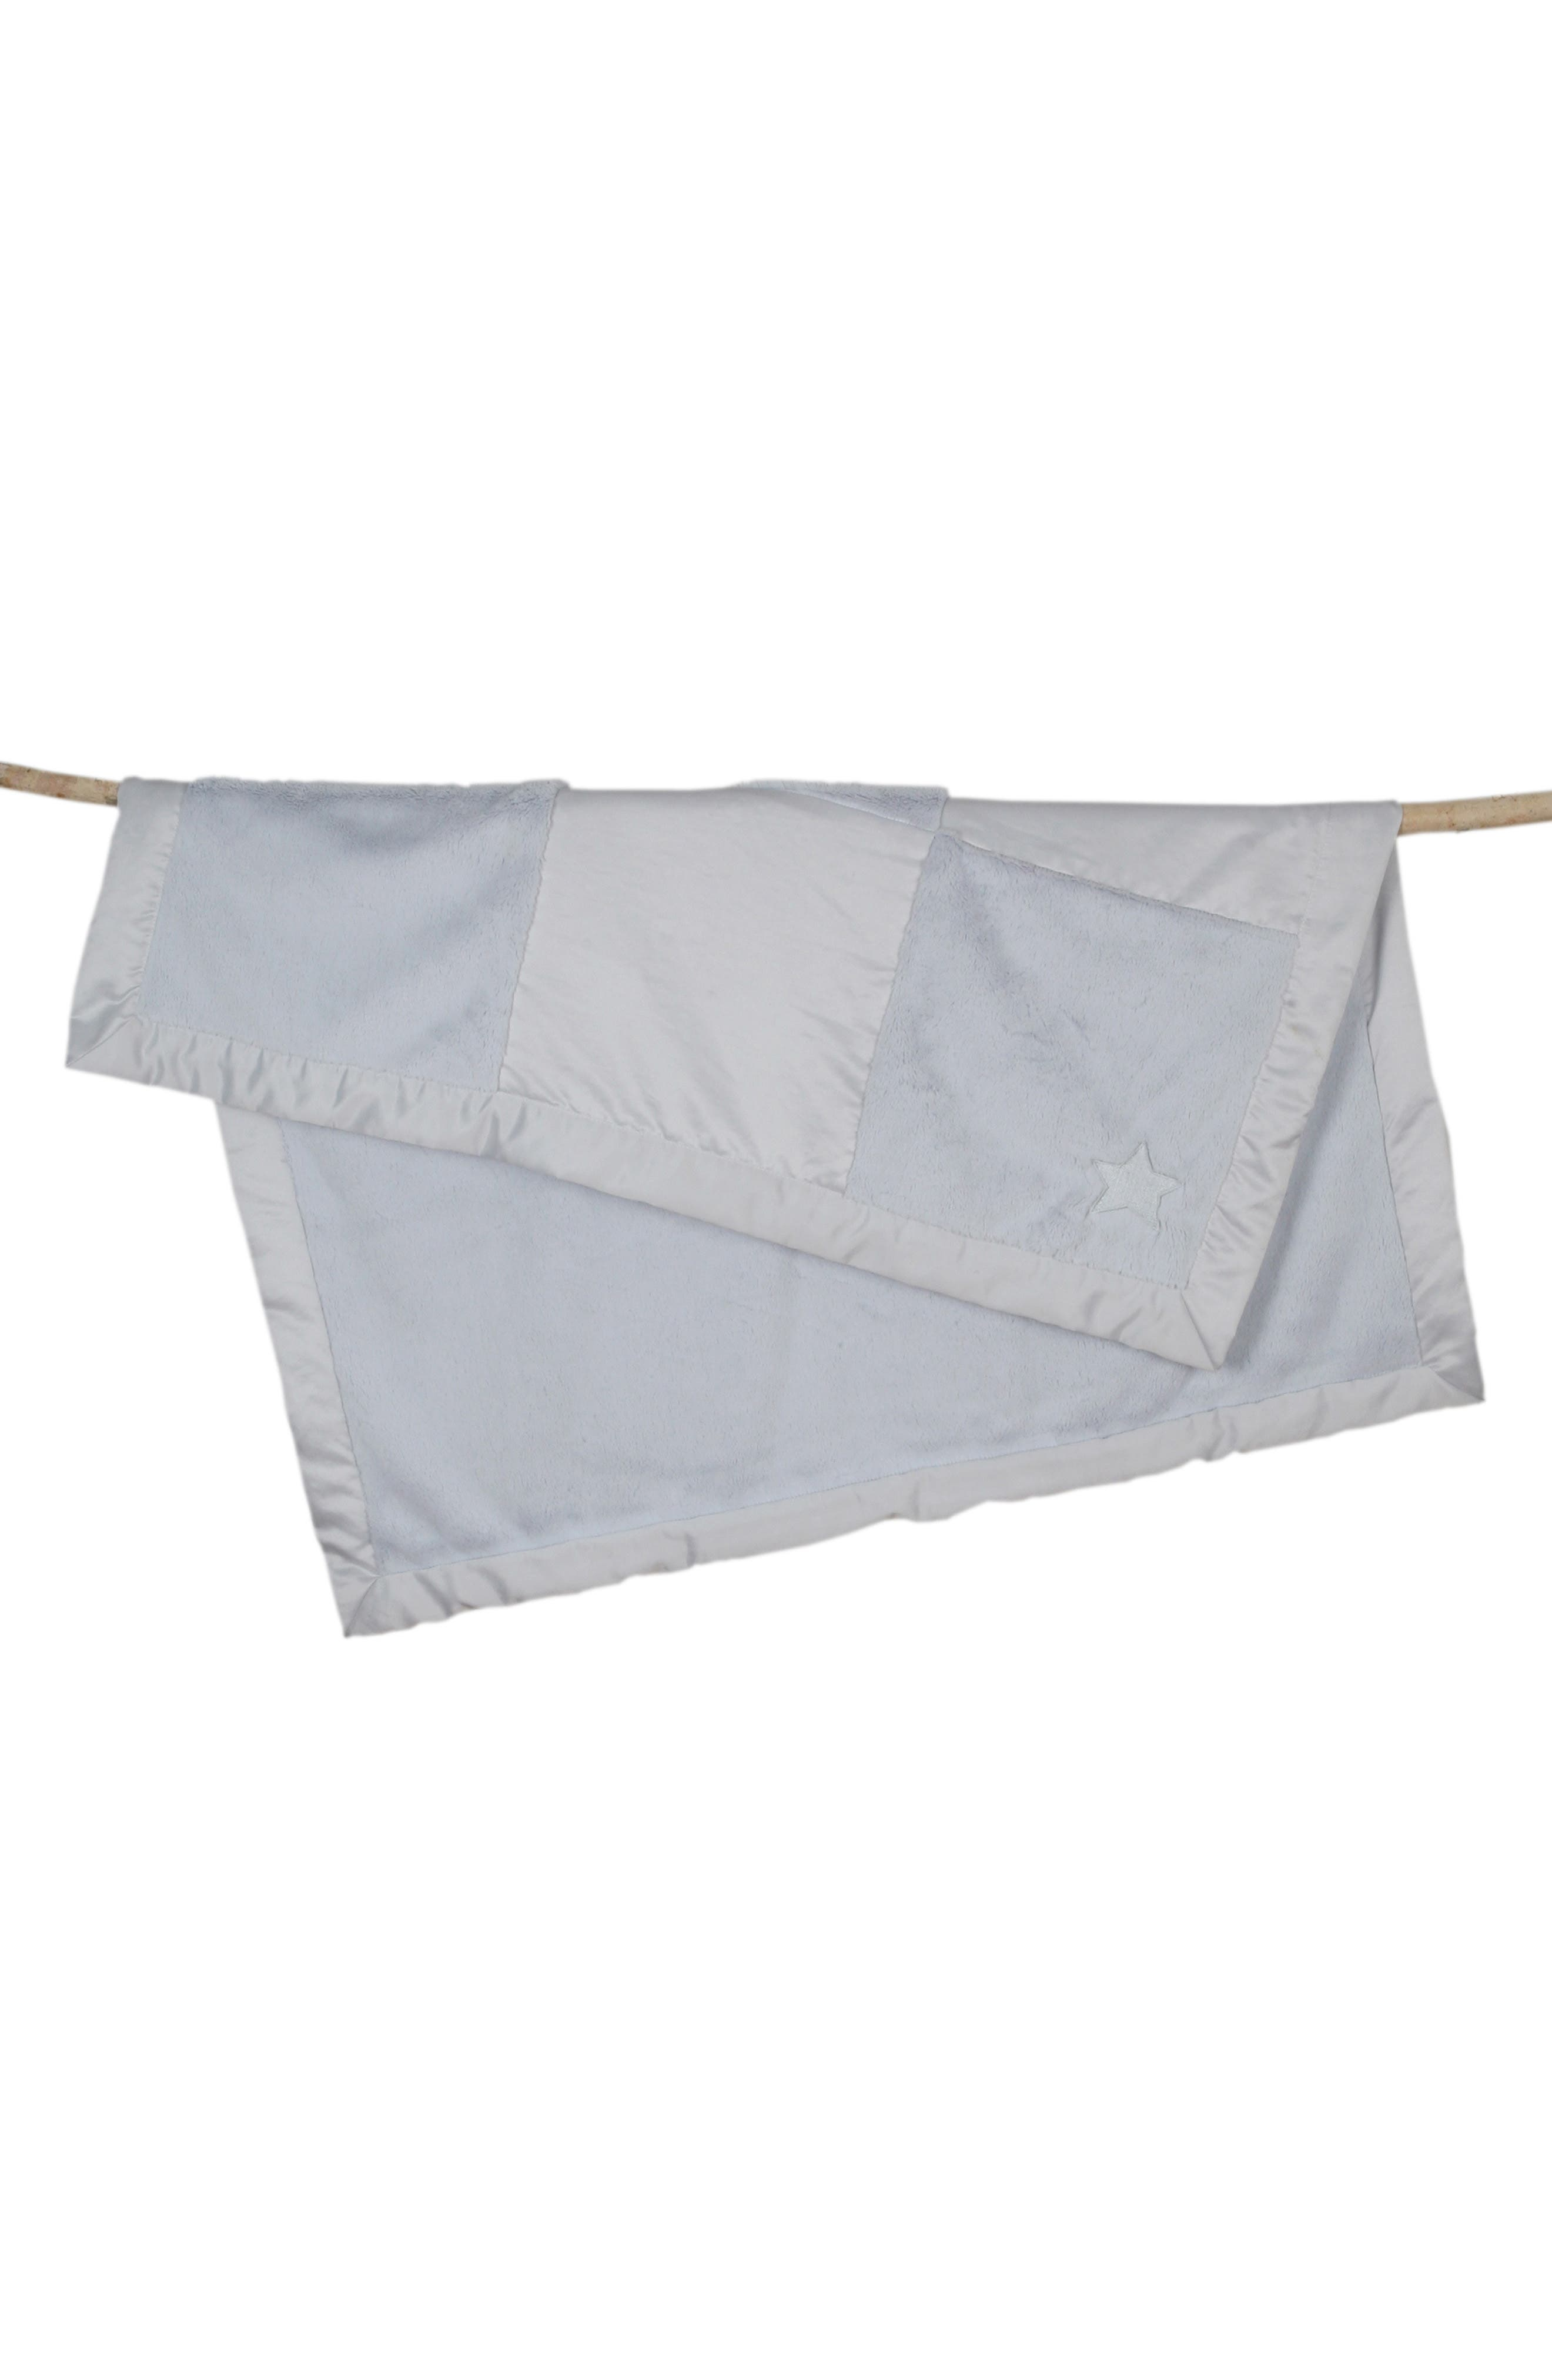 'Cuddle' Patchwork Receiving Blanket,                             Alternate thumbnail 3, color,                             400